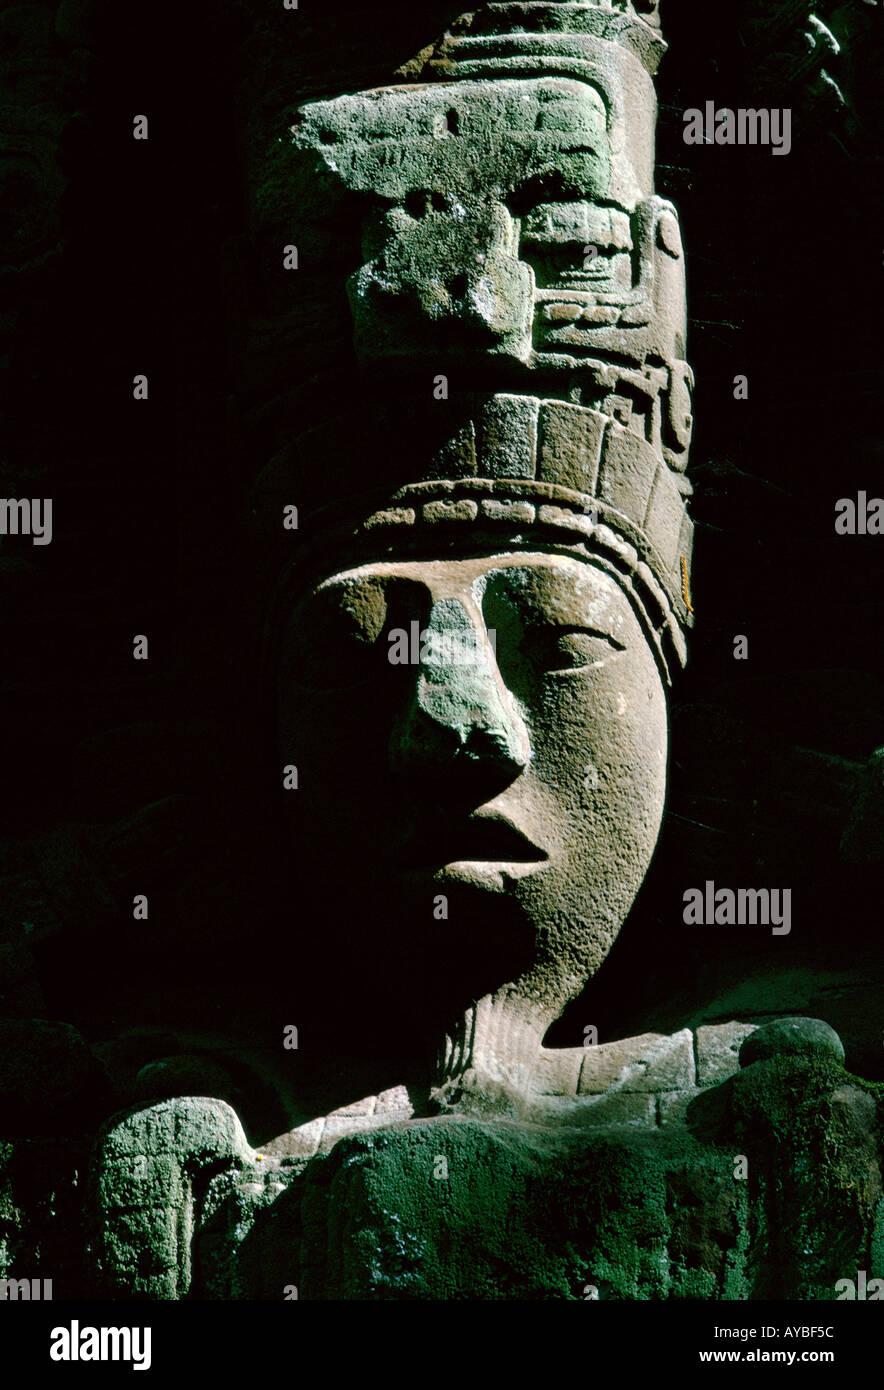 Maya ruins of Quiriguá in Guatemala Classic Period close up of head of Stela D representing King Cauac Sky - Stock Image